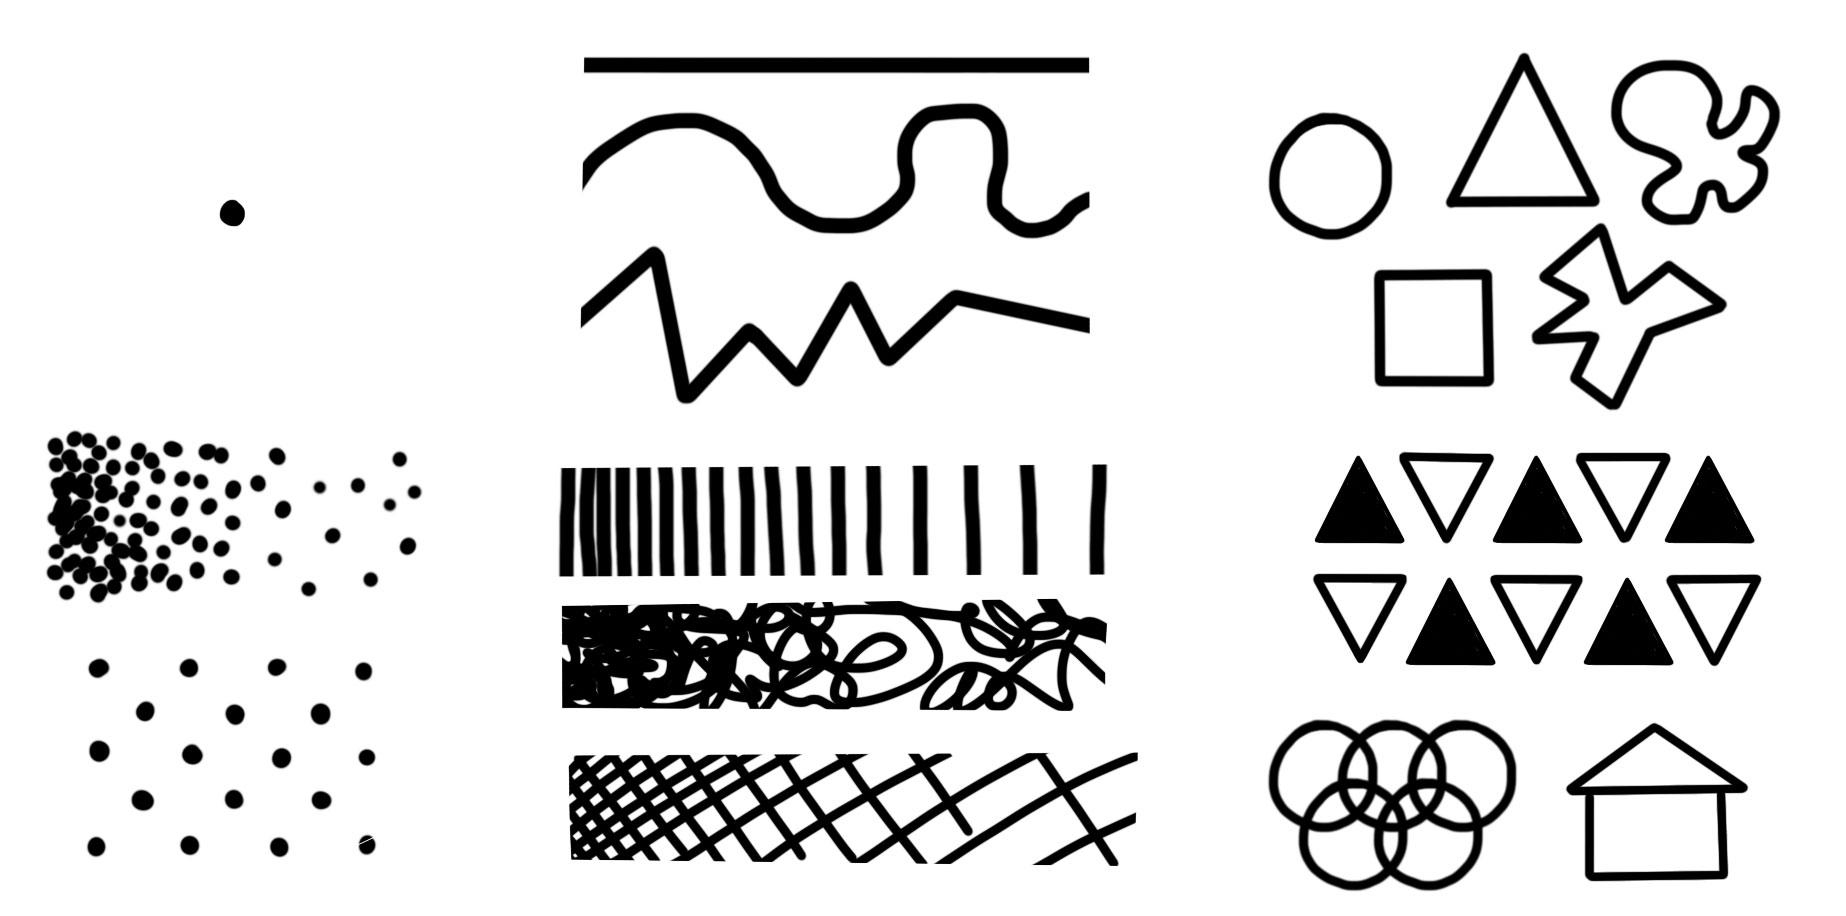 dots, lines, shapes